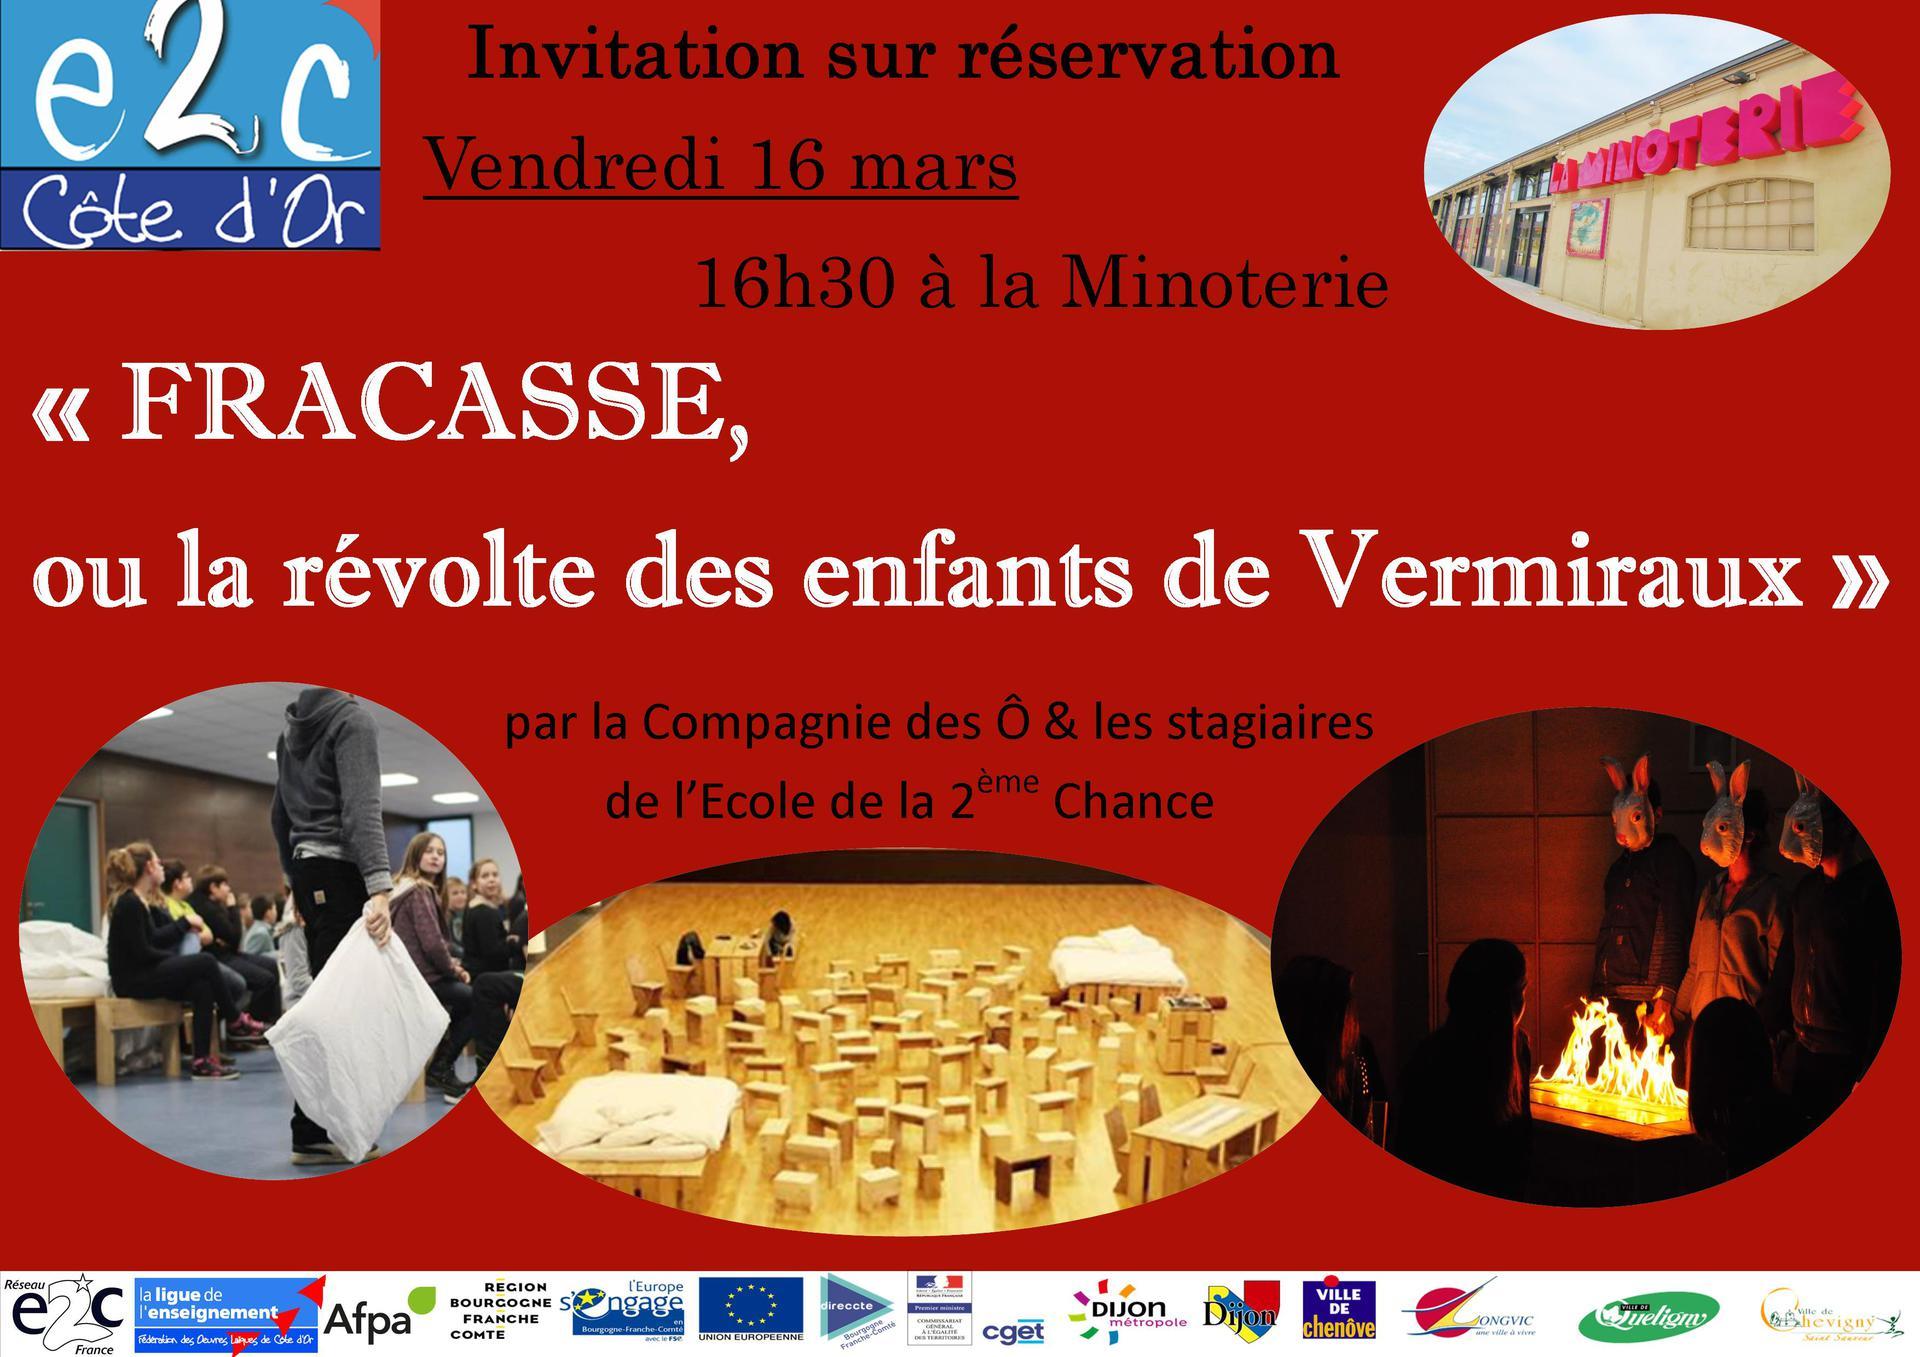 Invitation Fracasse E2C21 (002)